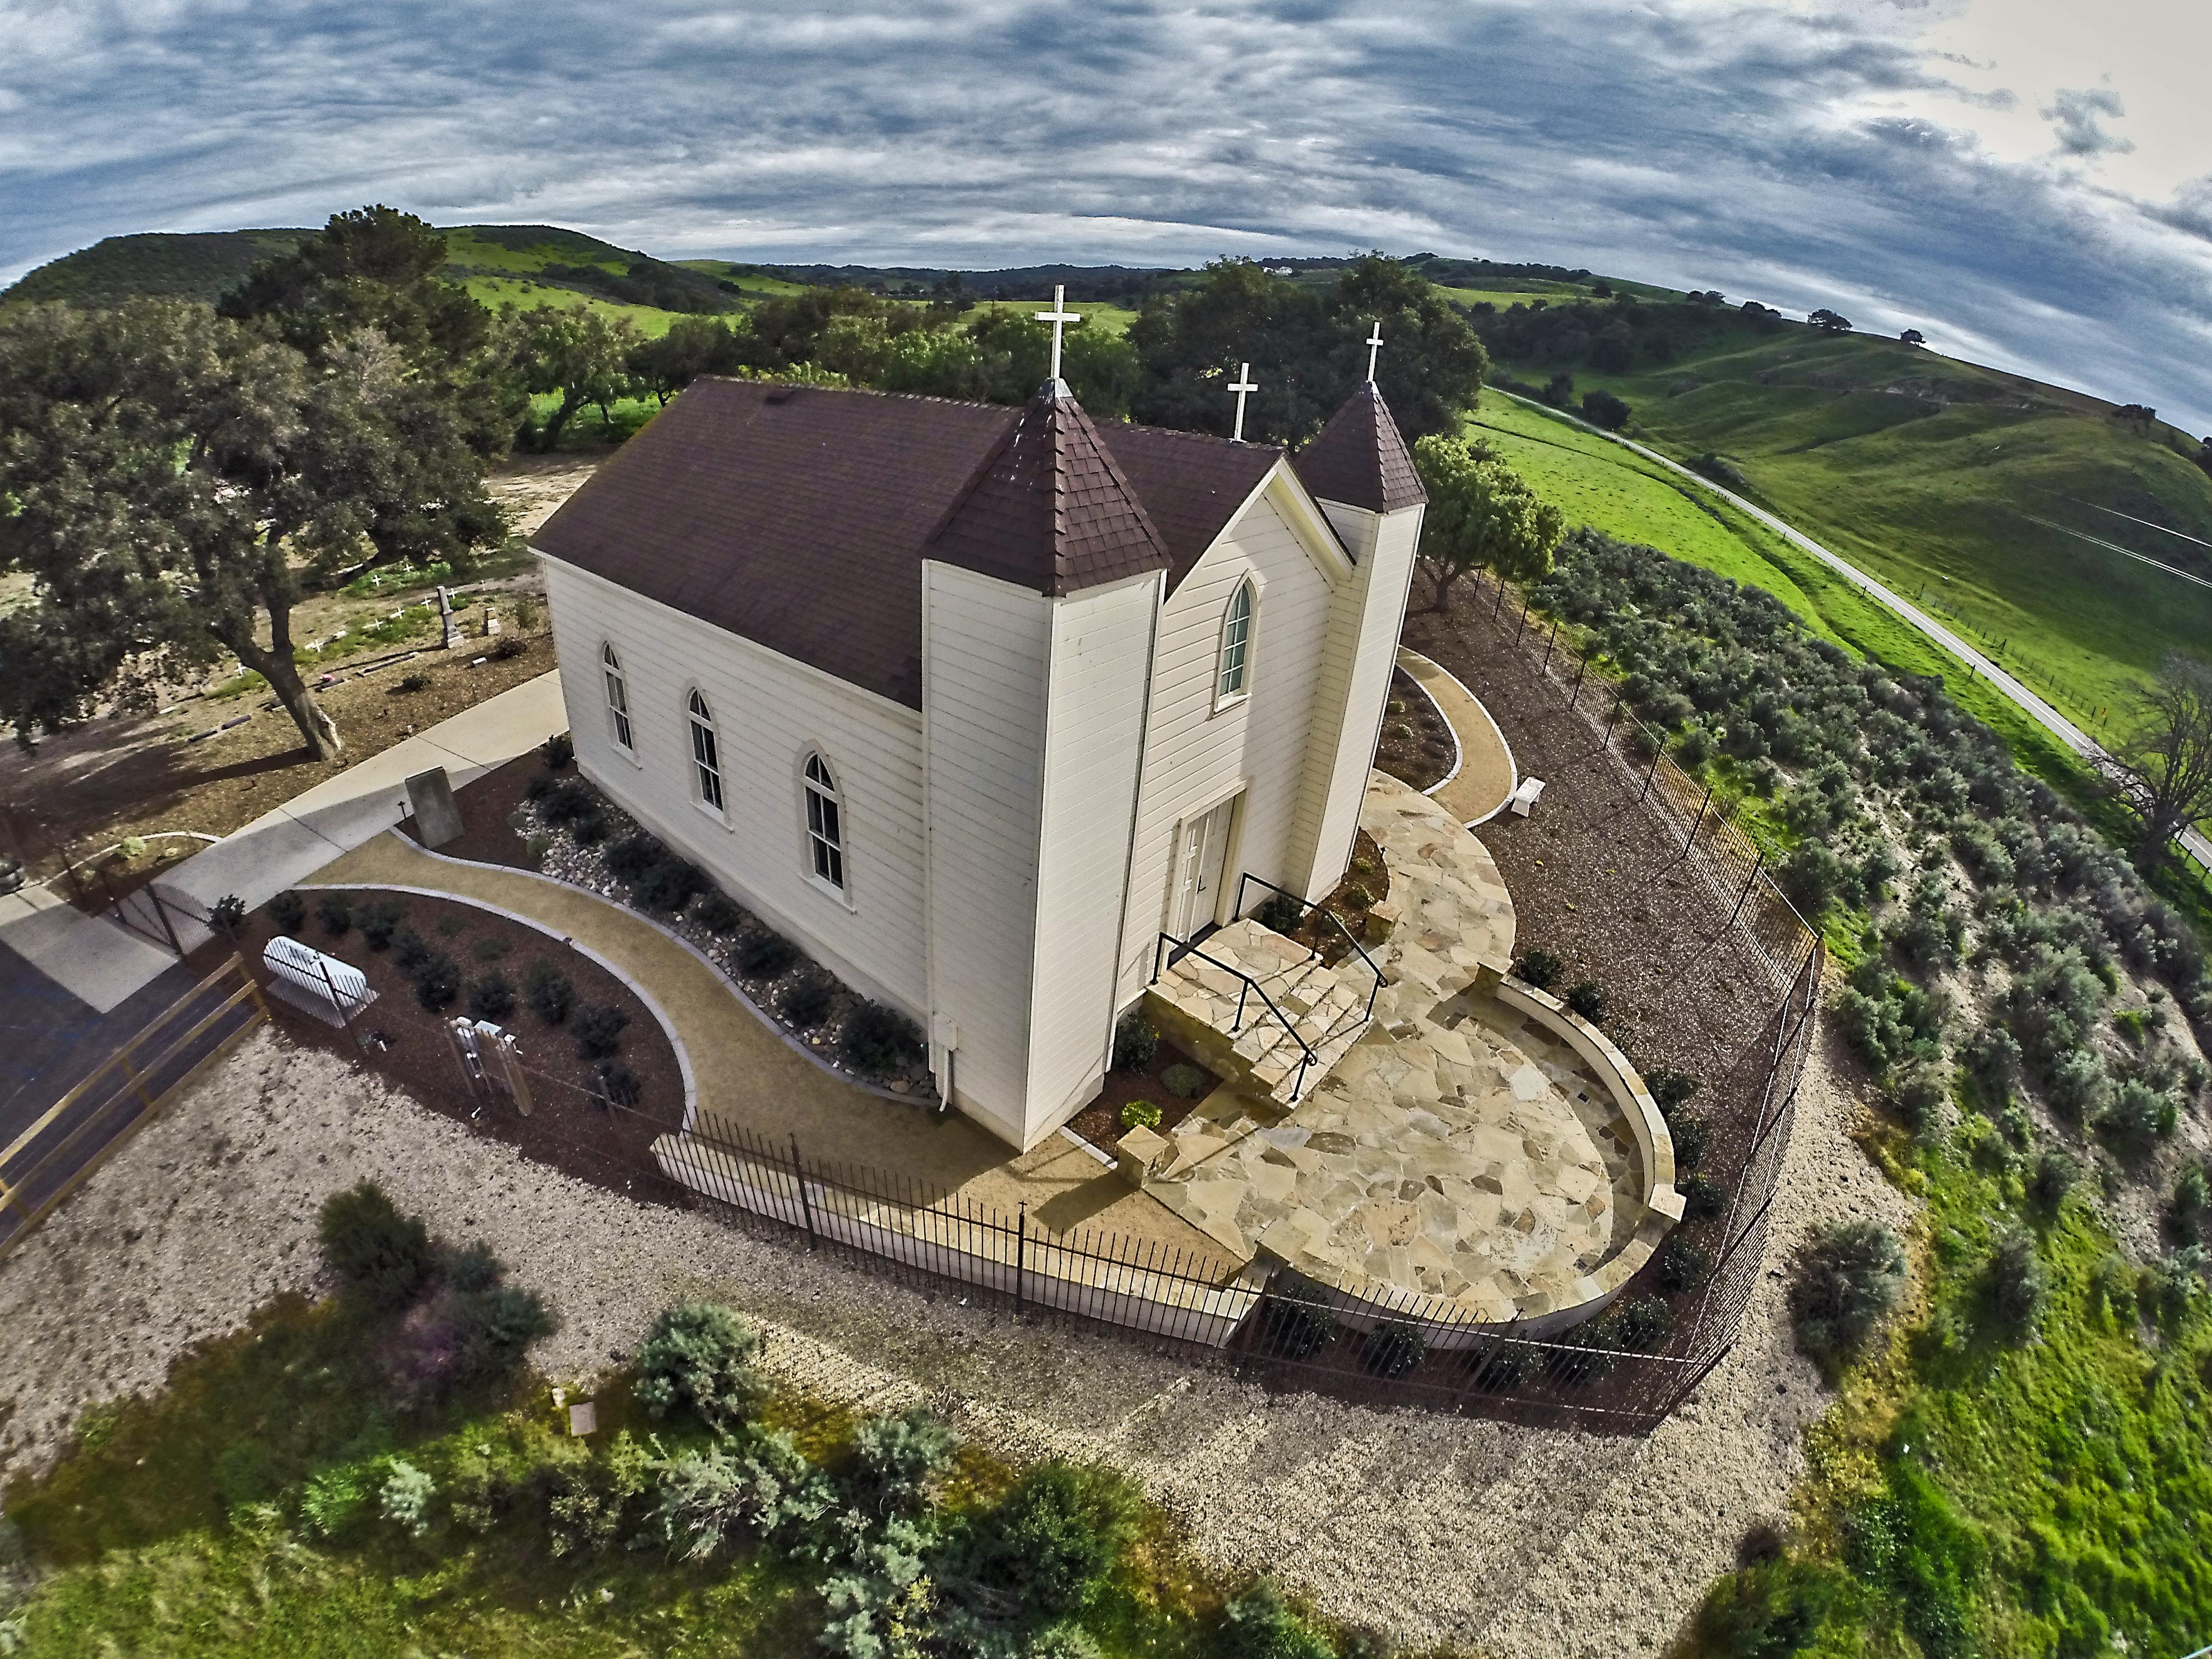 Aerial Photography For Santa Barbara And San Luis Obispo Counties